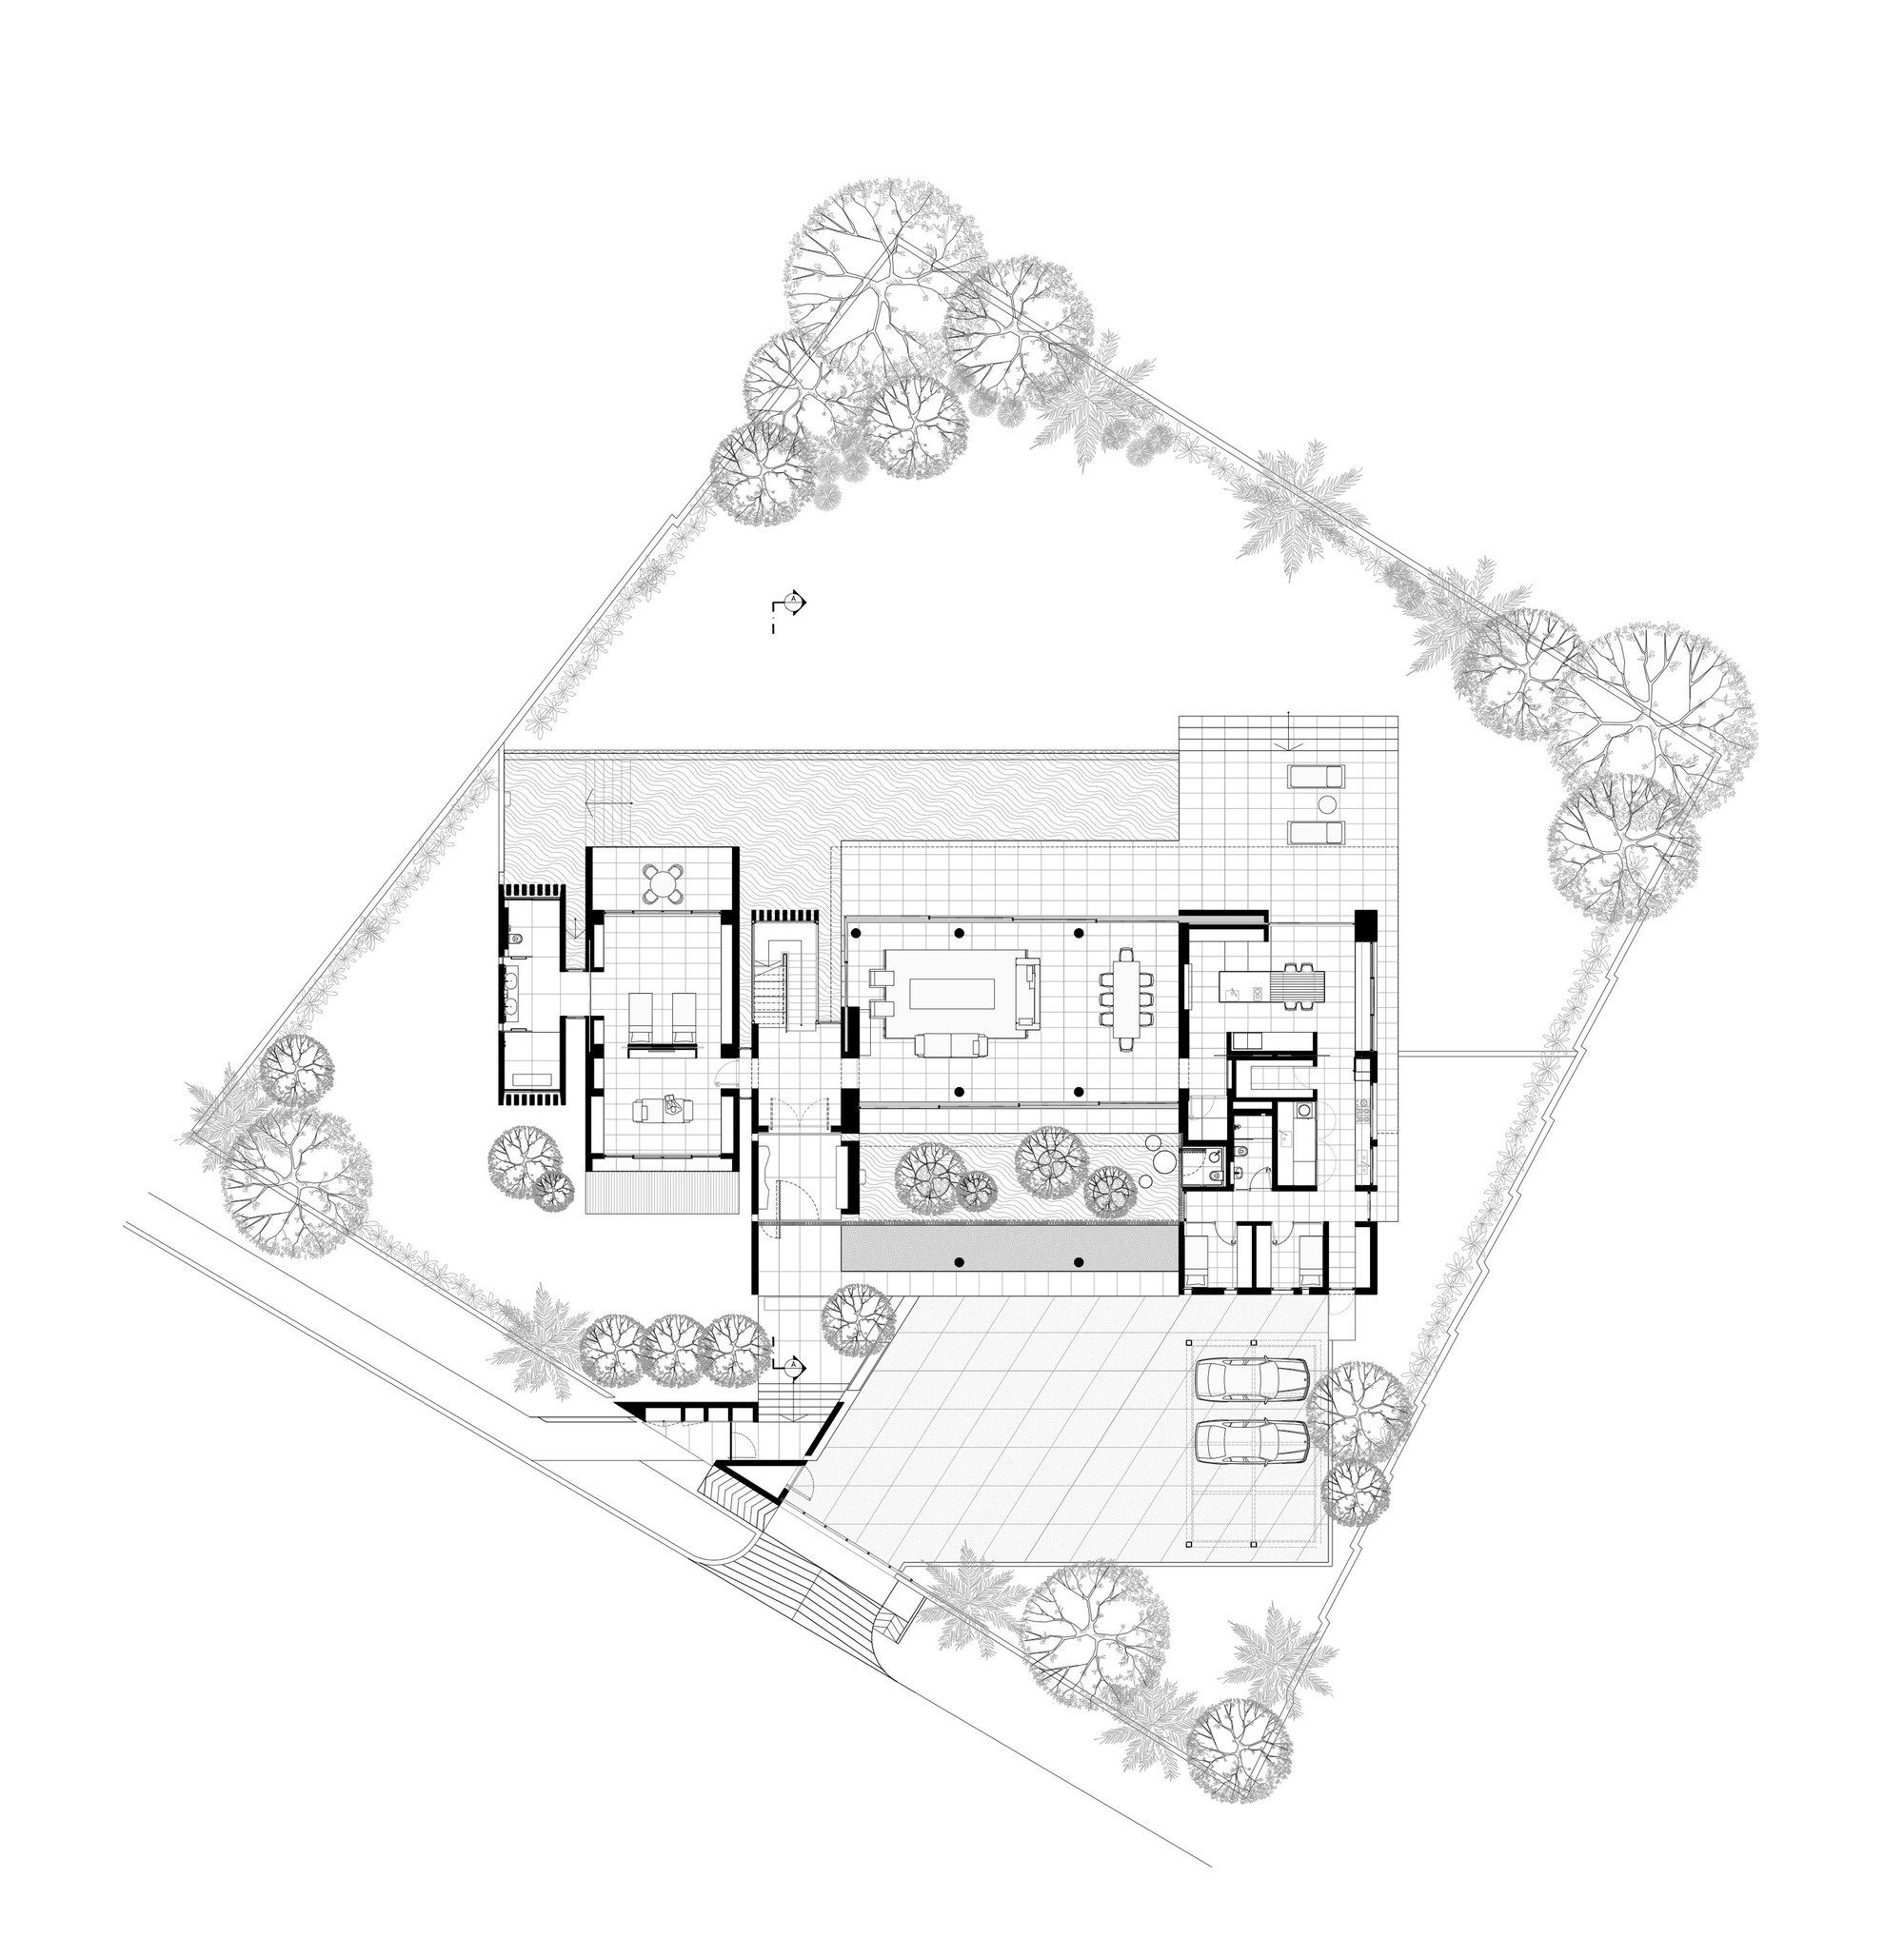 59btp house ong ong pte ltd archdaily floor plan